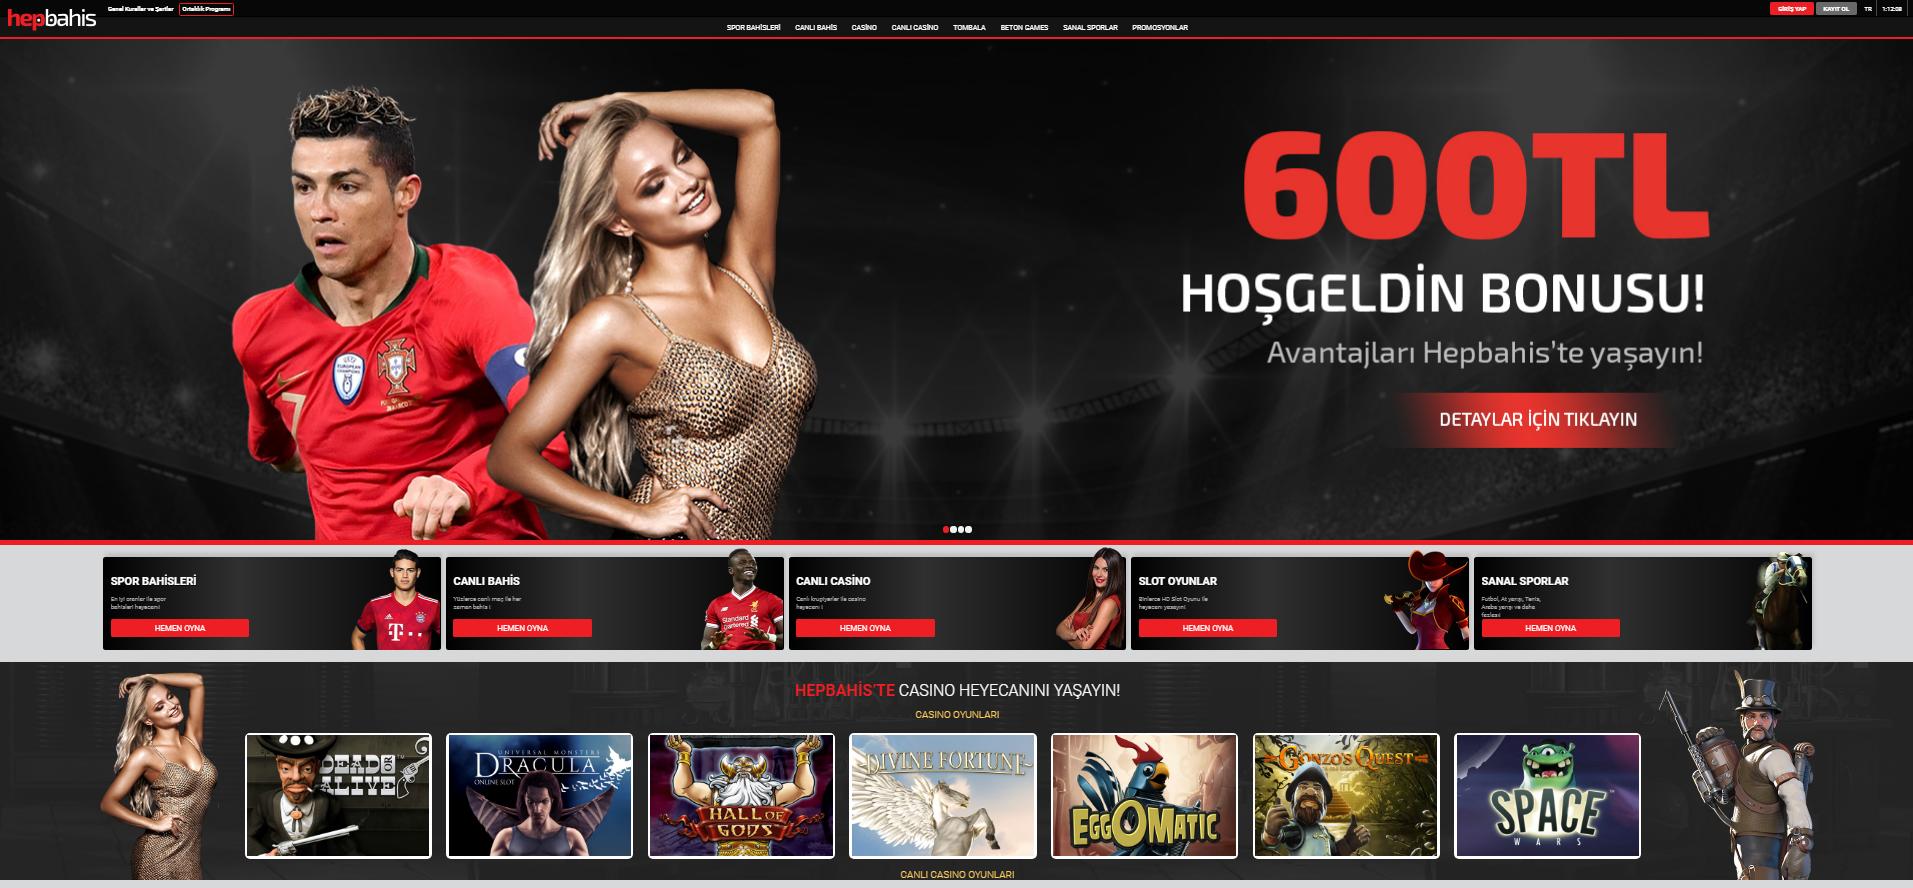 Hepbahis Screenshot